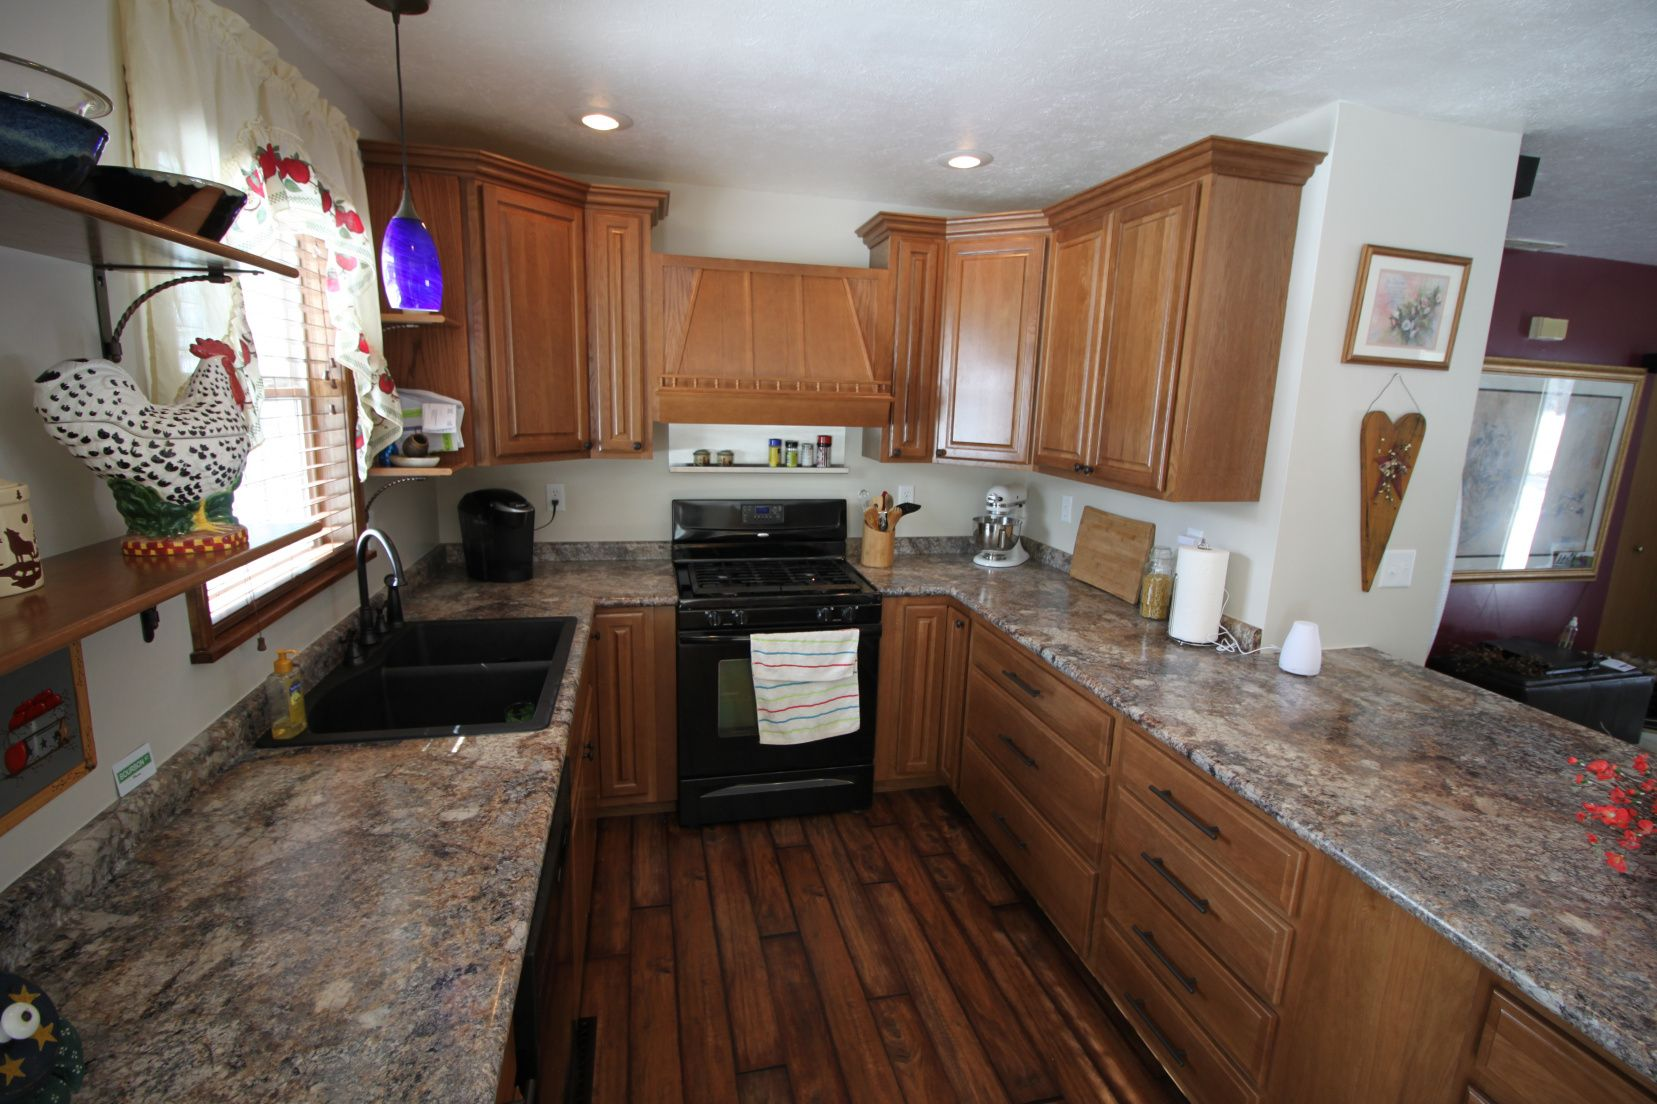 2018 Quartz Countertops South Bend Indiana Small Kitchen Island Ideas With Seating Check Unique Kitchen Backsplash Small Kitchen Island Modern Kitchen Design